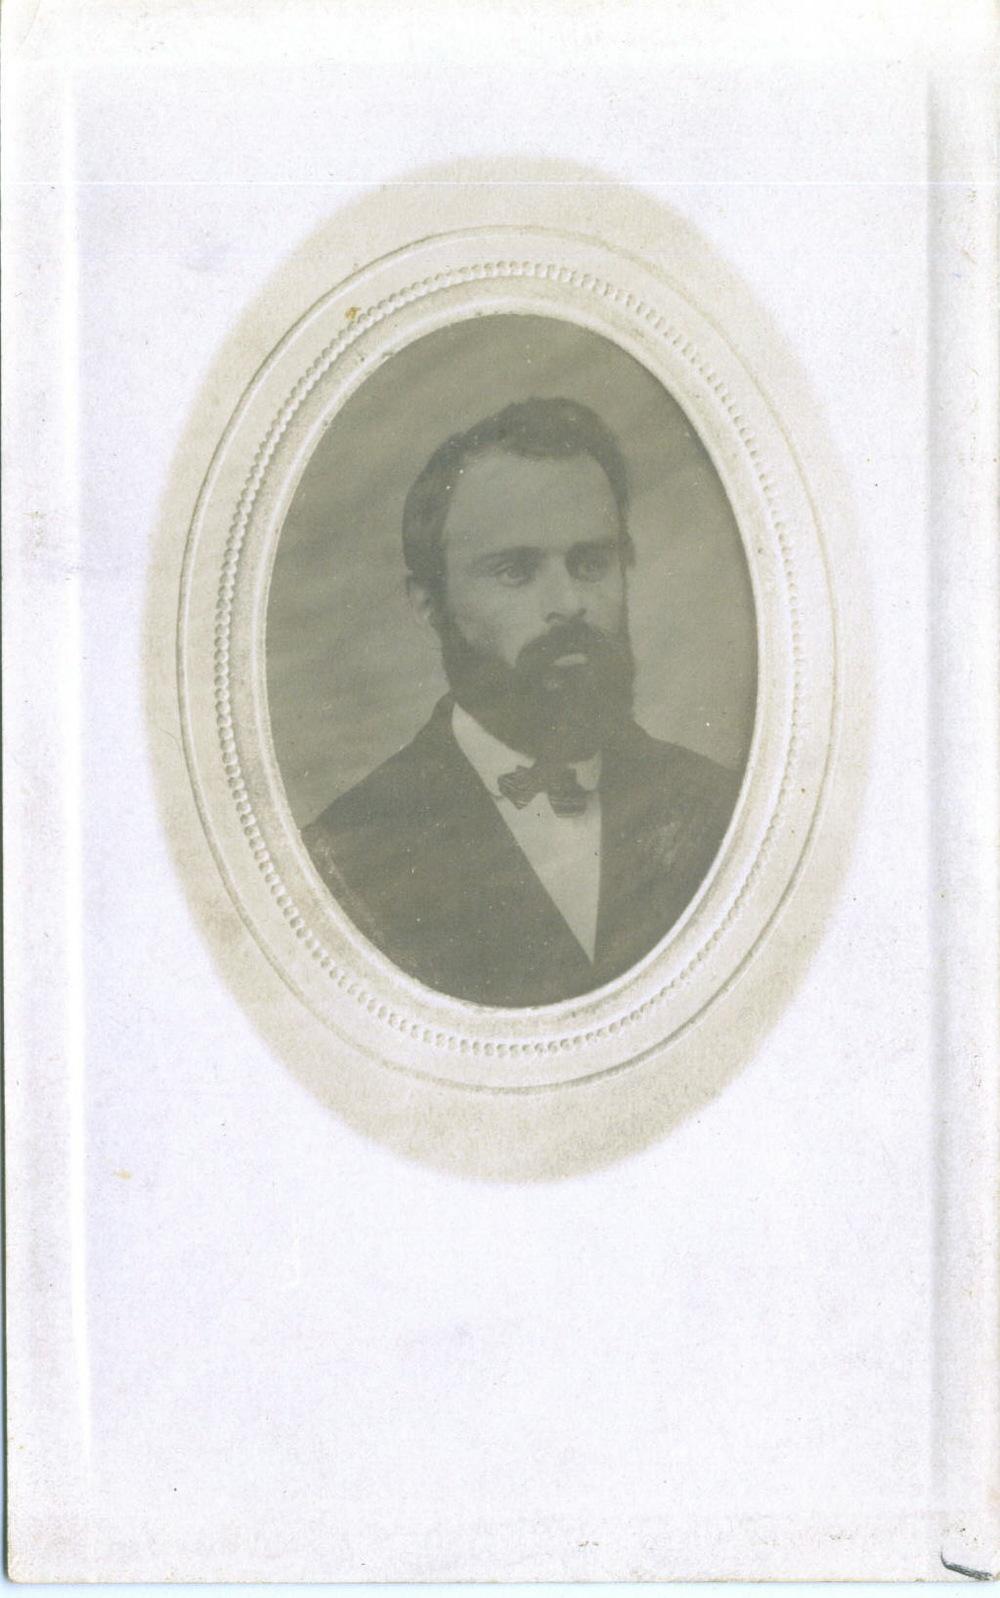 Francis Austin Pomeroy, 1846-1932